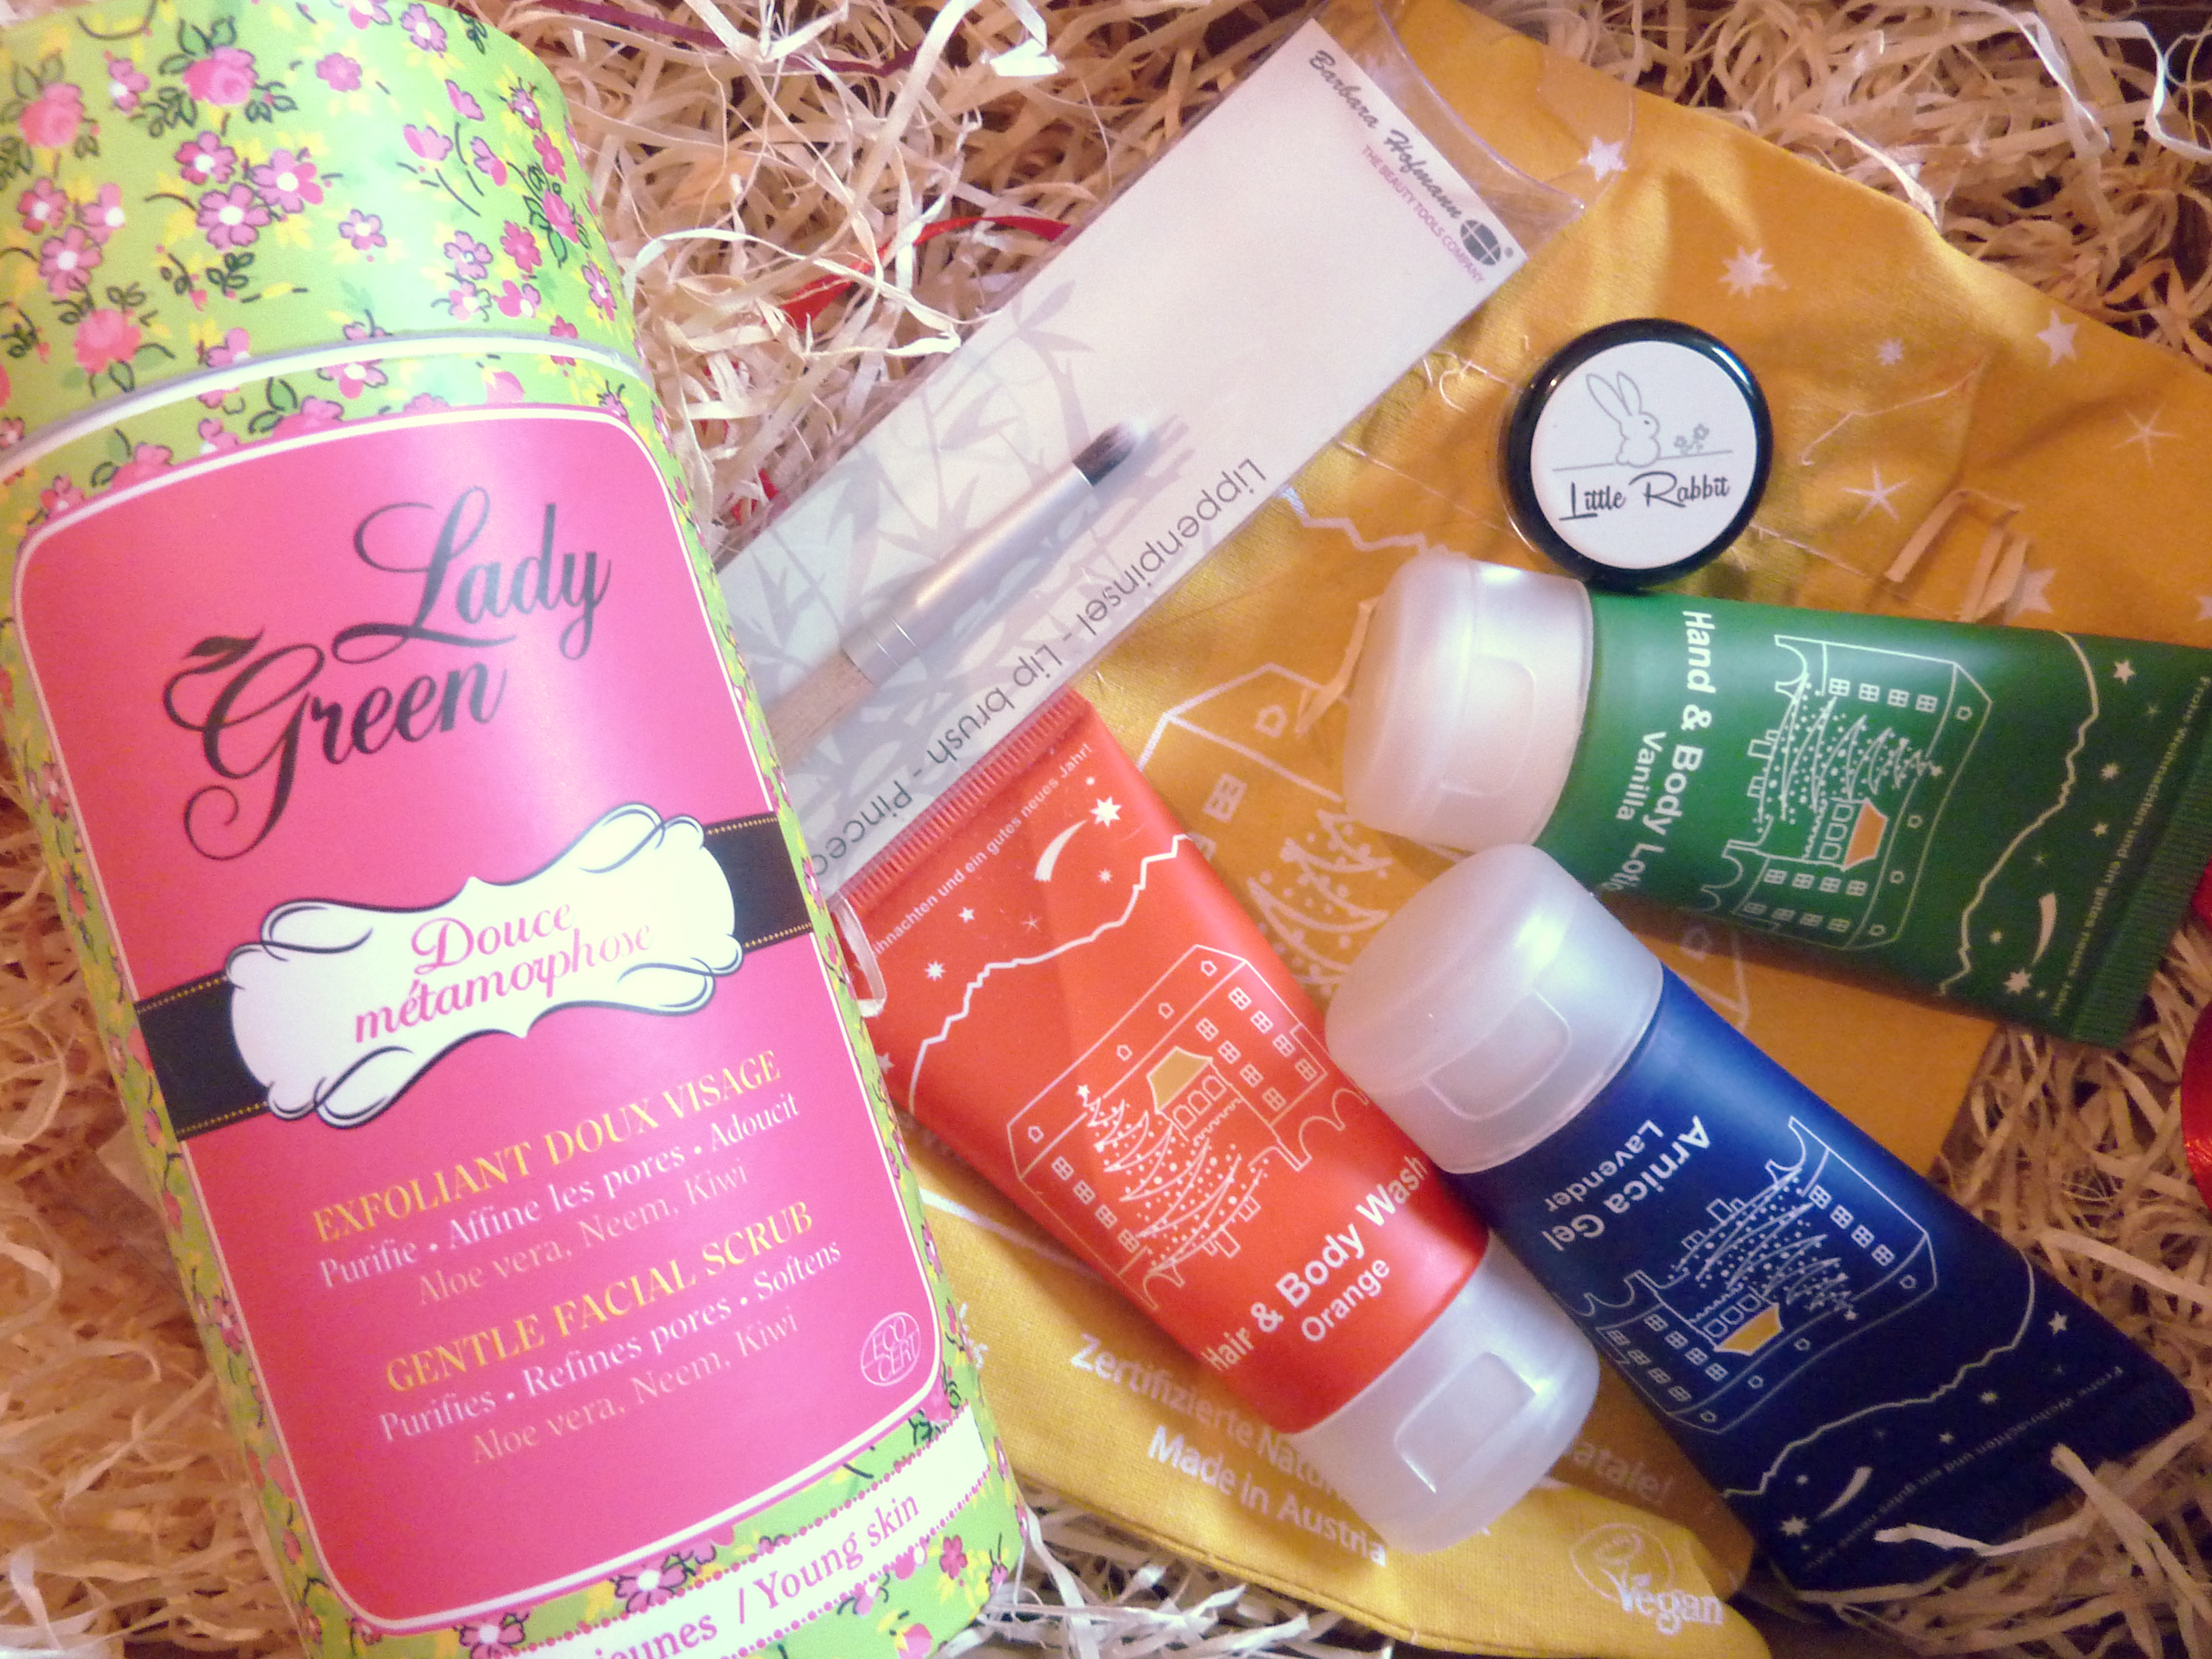 Love Beauty Box: Naturkosmetik Beauty Box mit tierversuchsfreien Produkten